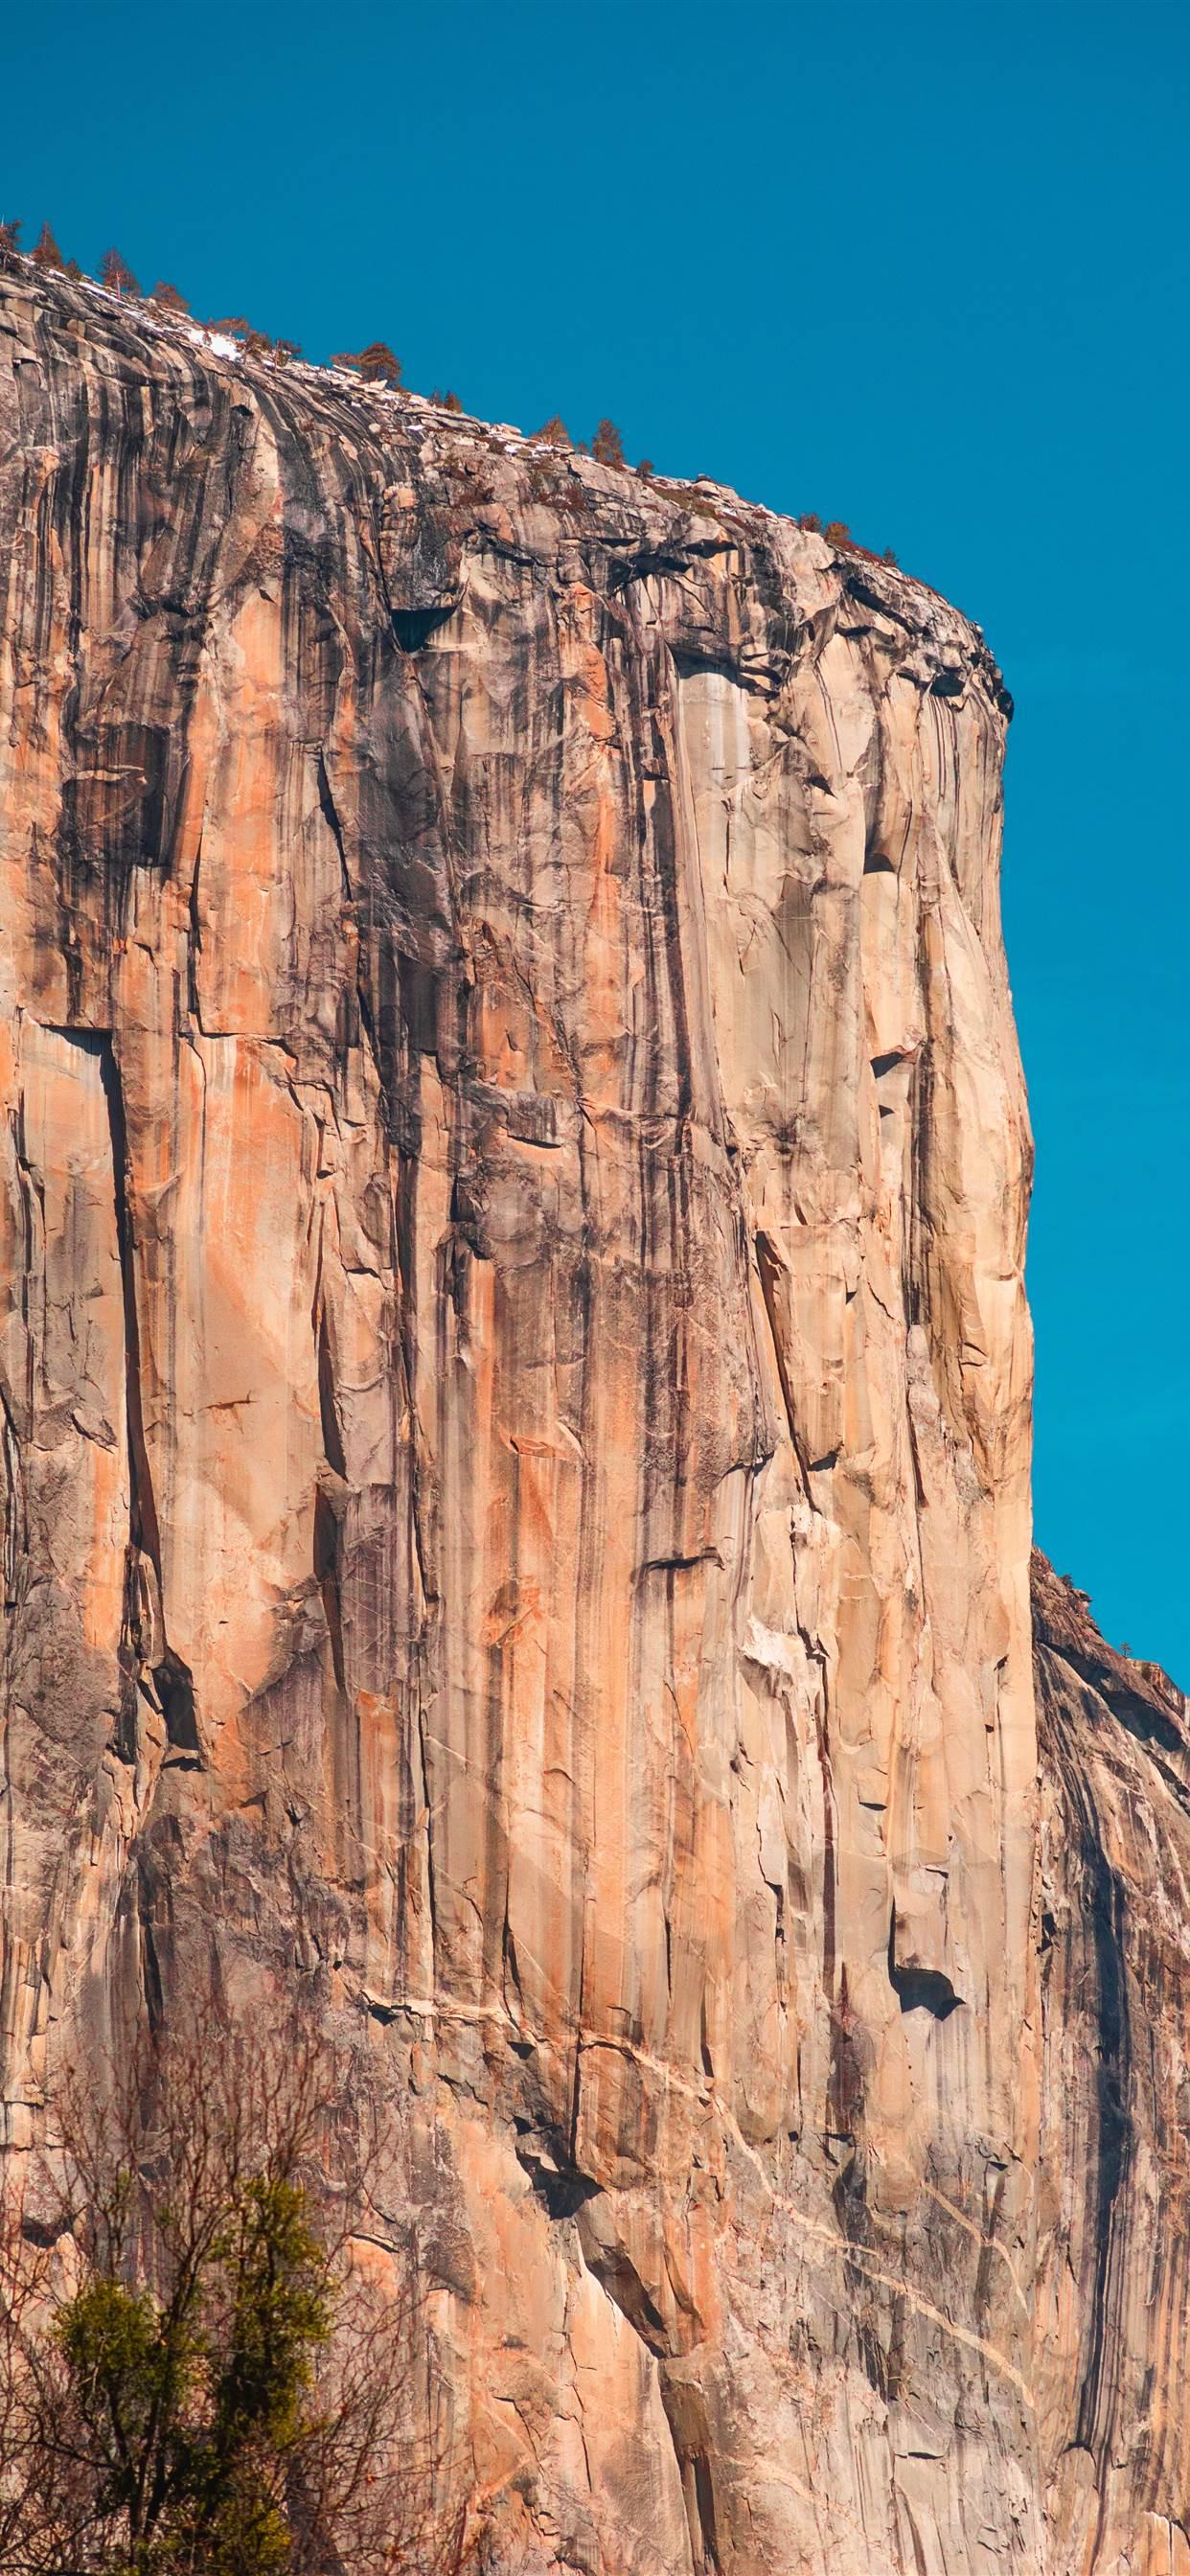 Yosemite National Park 3112577 Hd Wallpaper Backgrounds Download